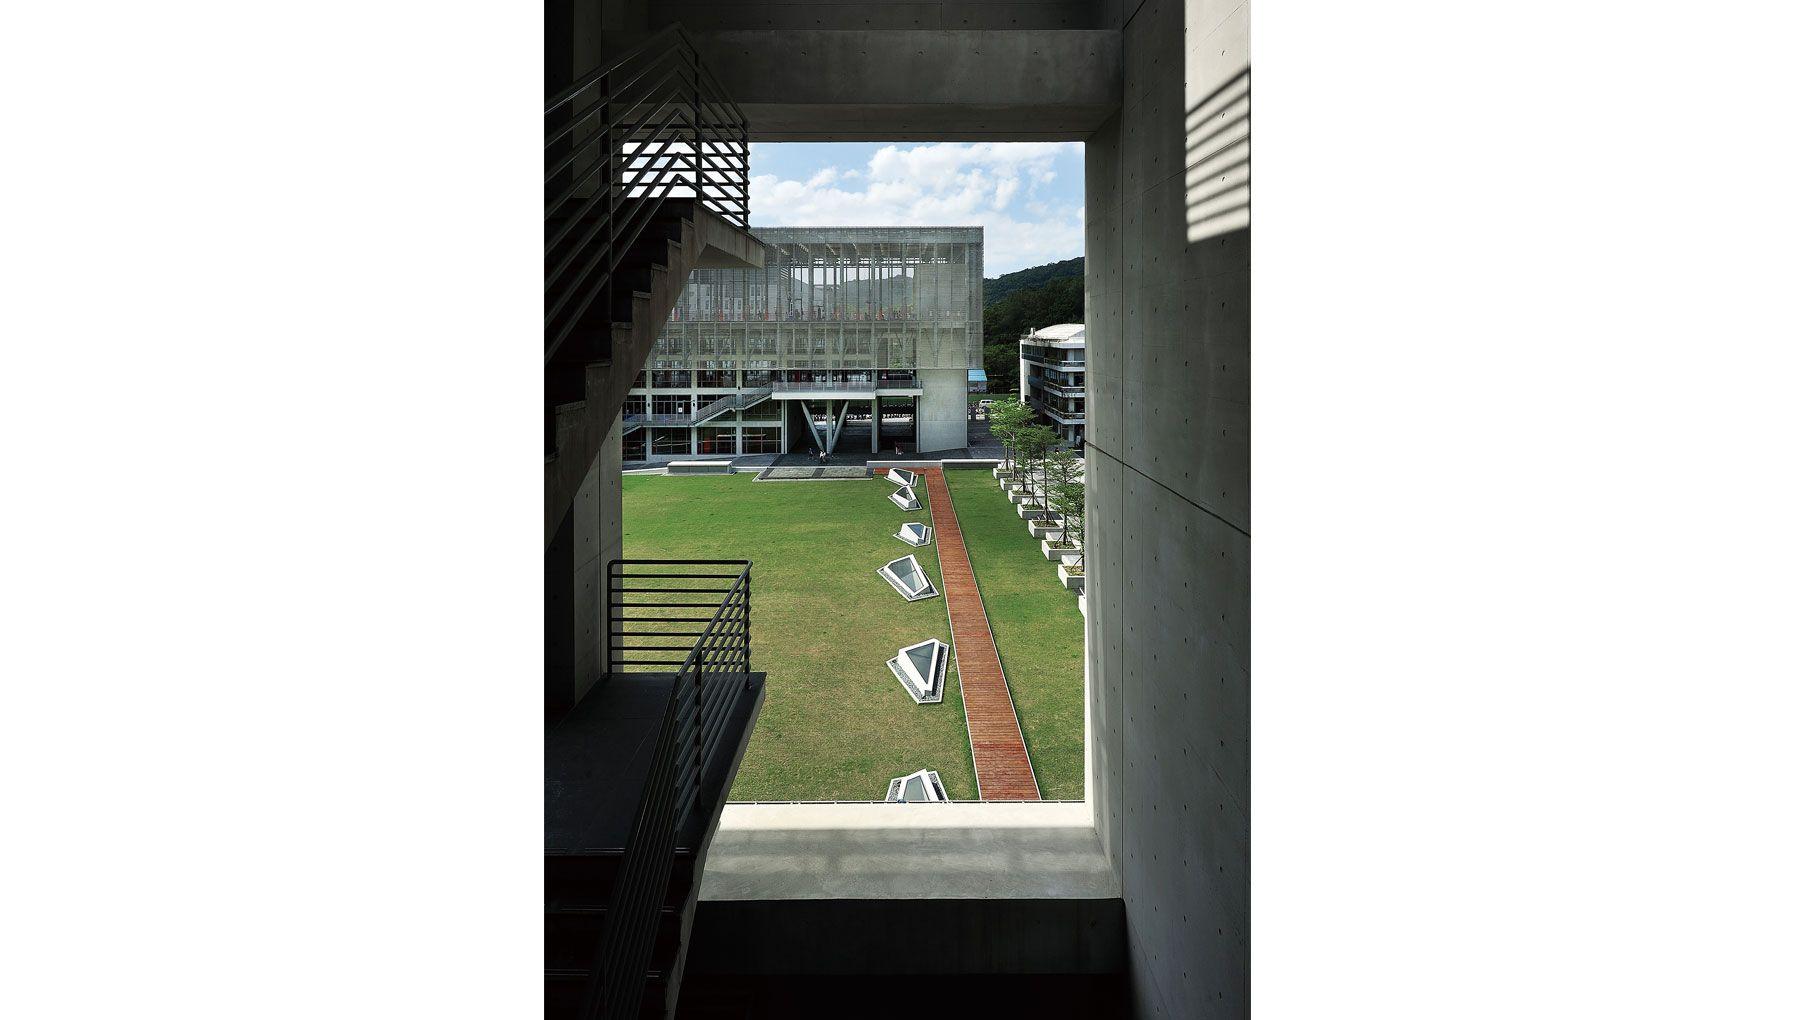 KRISYAO|ARTECH | Shih Chien University Gymnasium and Library